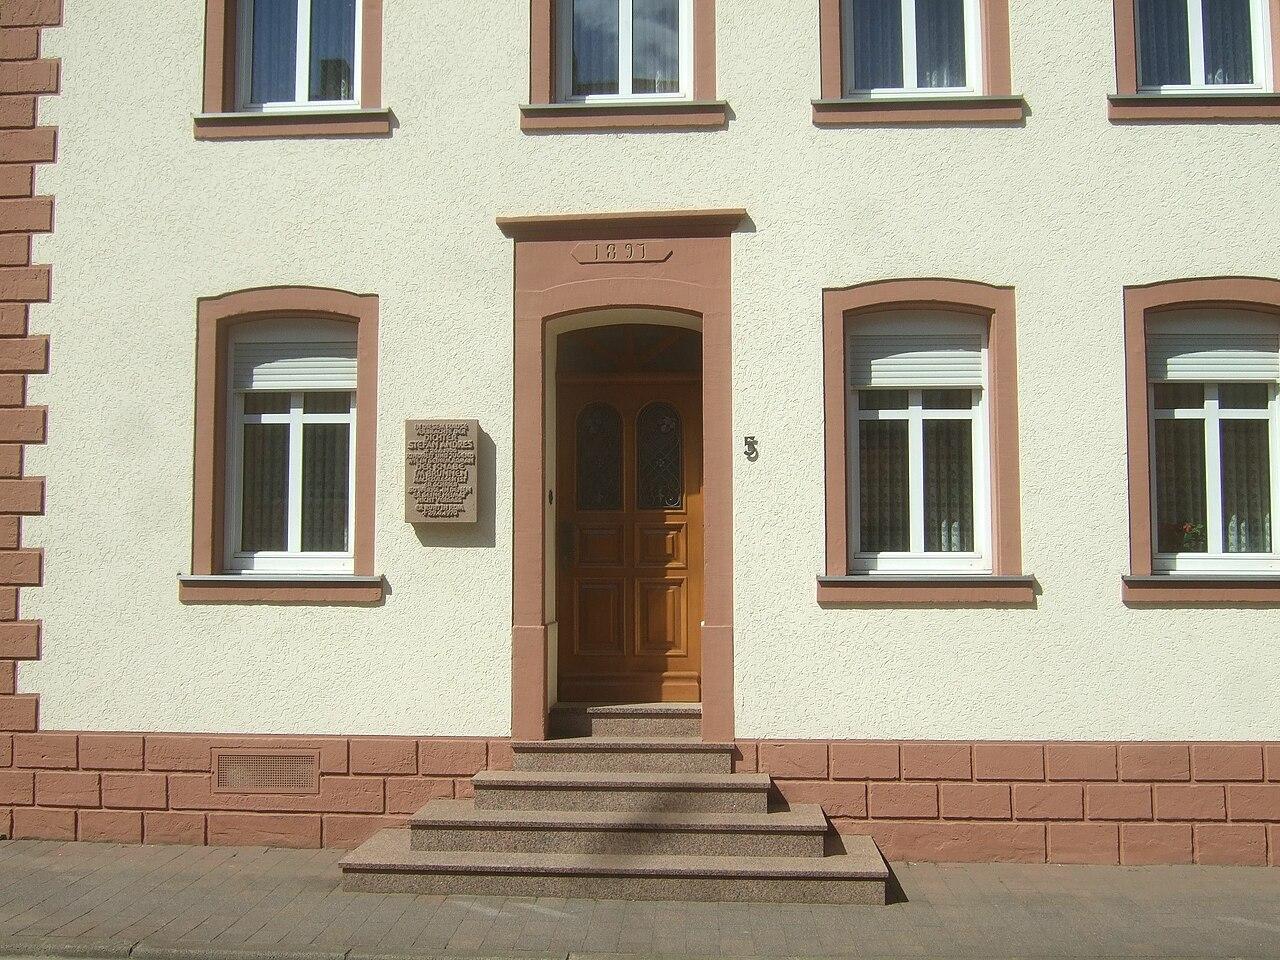 file schweich wohnhaus stefan wikimedia commons. Black Bedroom Furniture Sets. Home Design Ideas